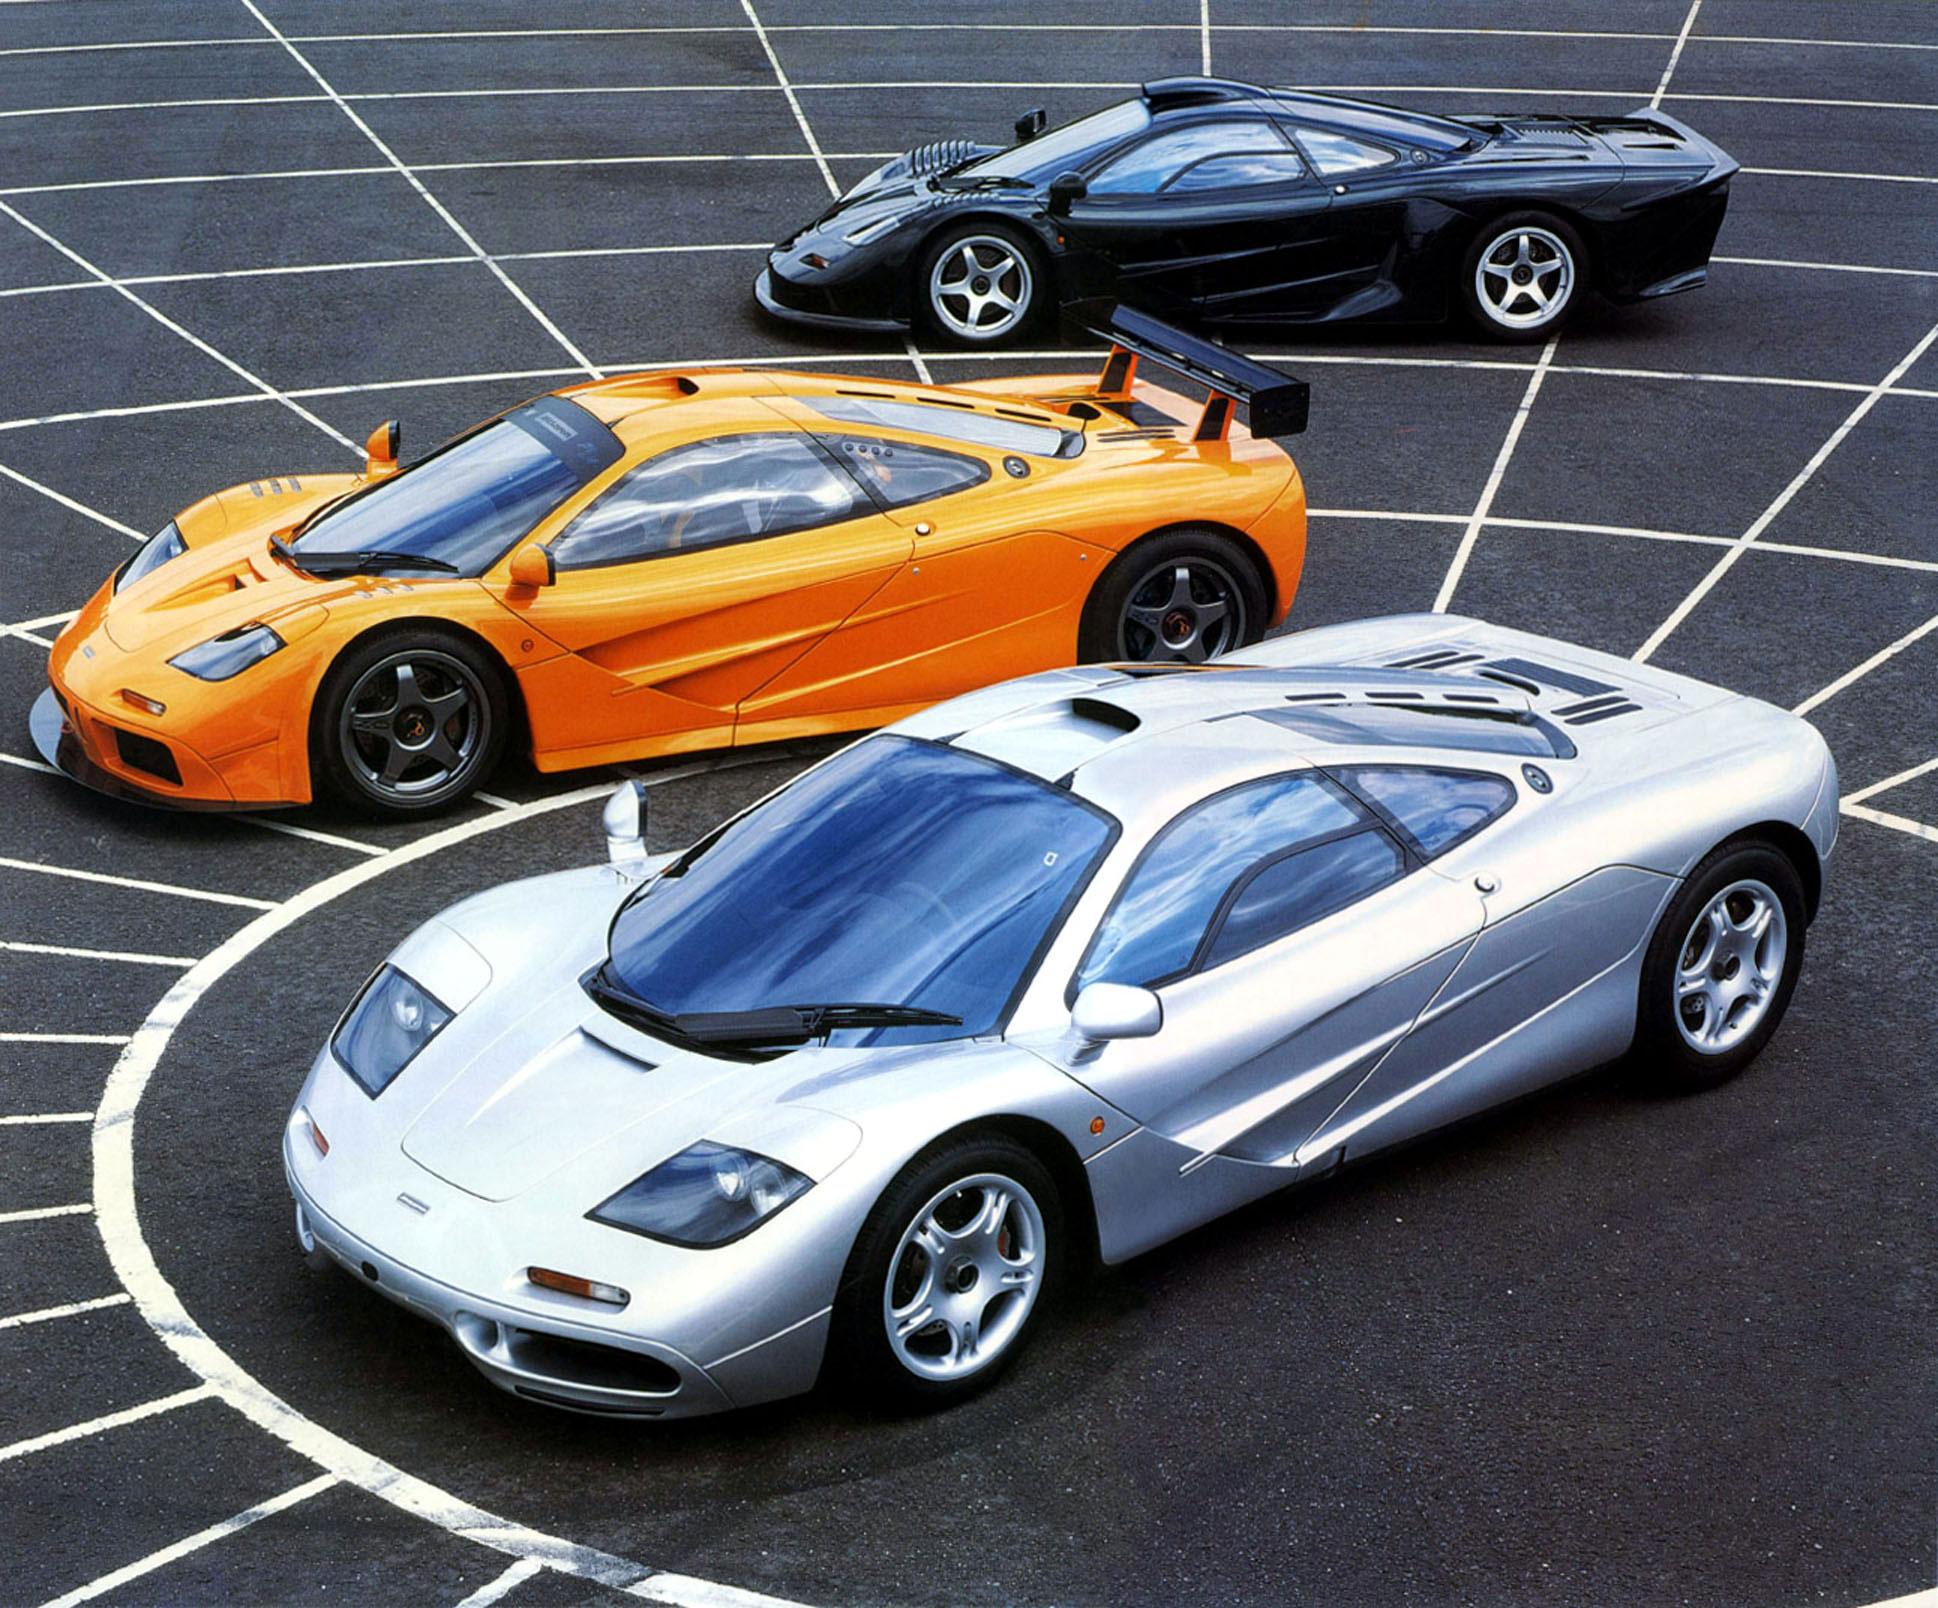 McLaren M1 A - specs, photos, videos and more on TopWorldAuto